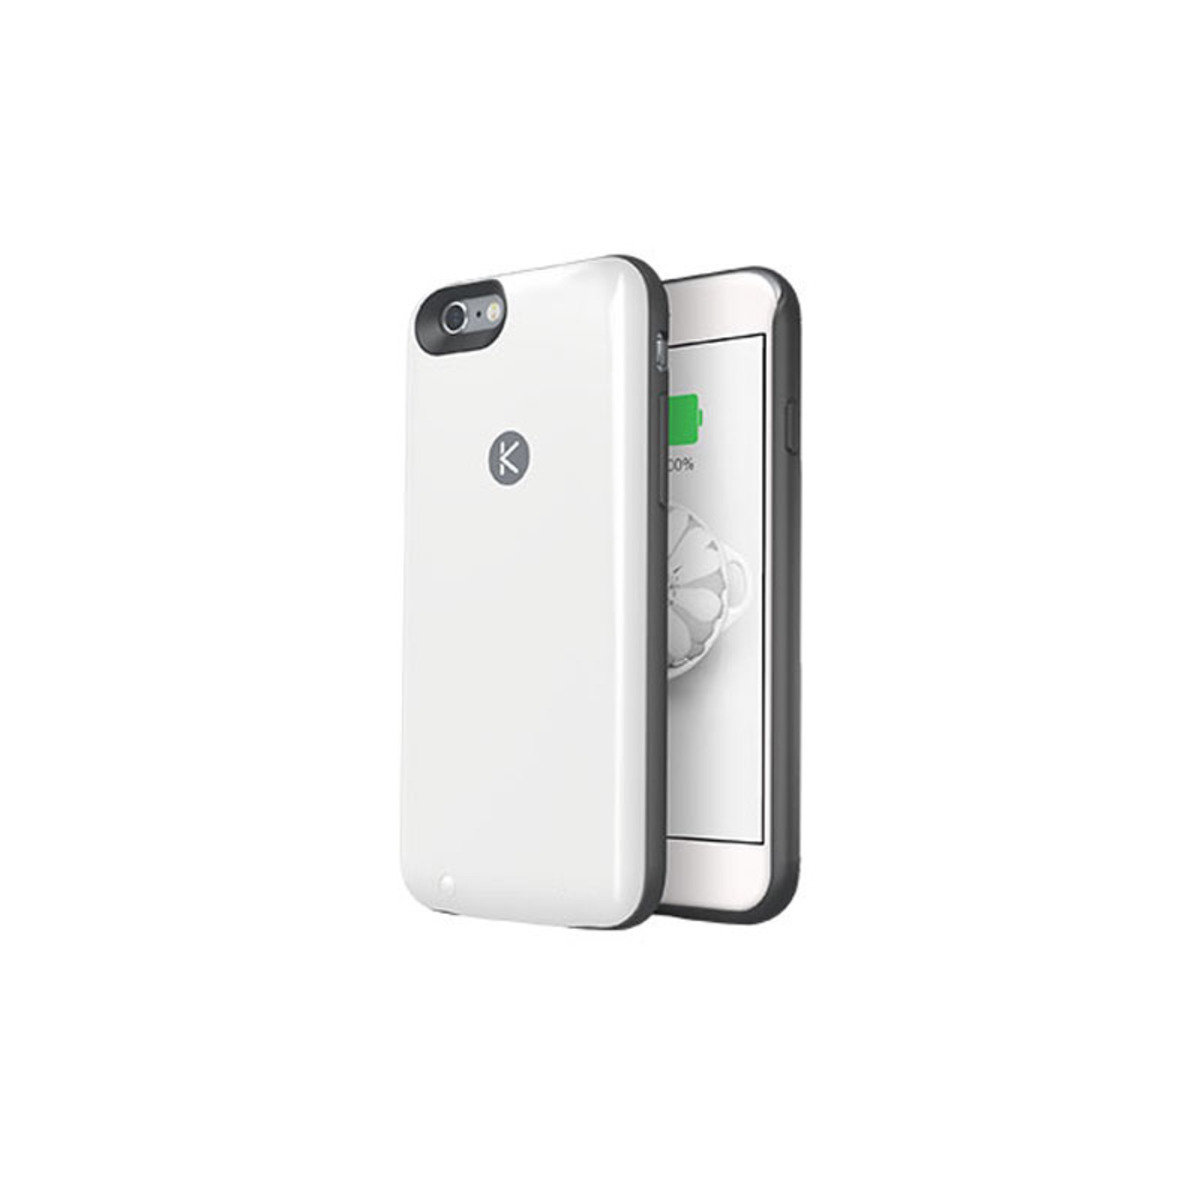 iPhone 6 / 6S 專用機殼內置64GB連2400mAh充電池 黑色+白色